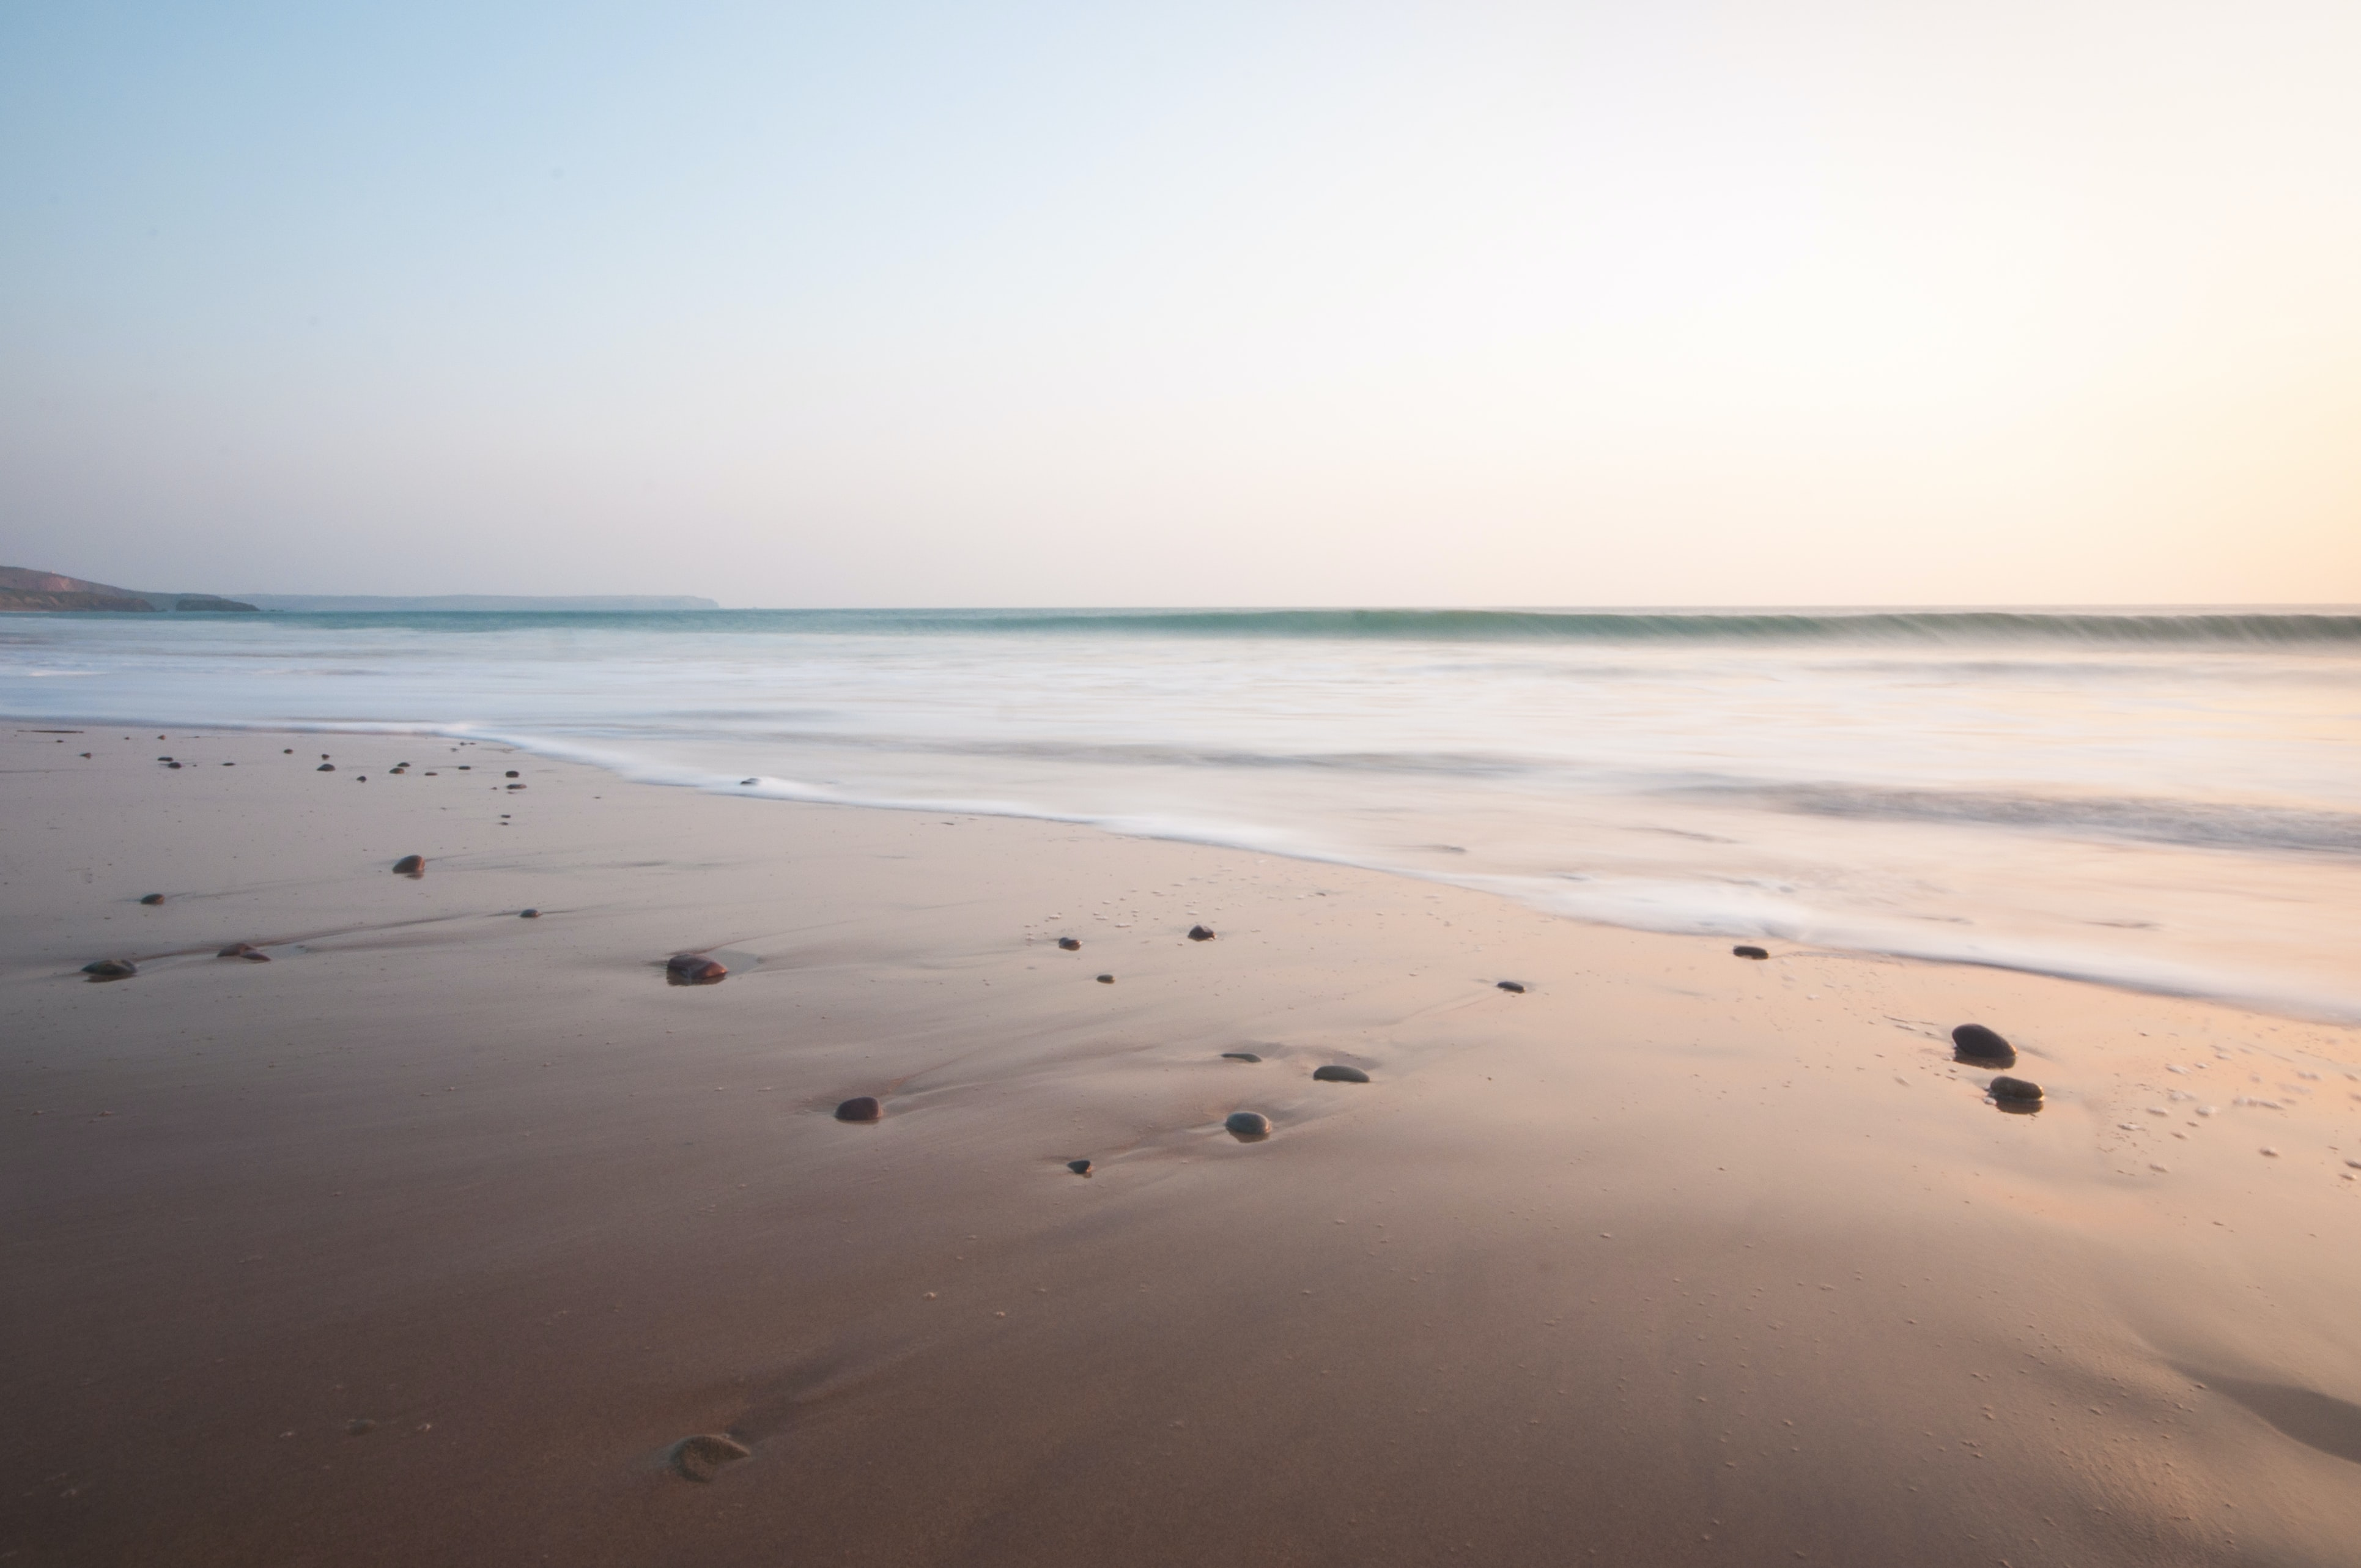 Ocean washing ashore Freshwater West sand beach